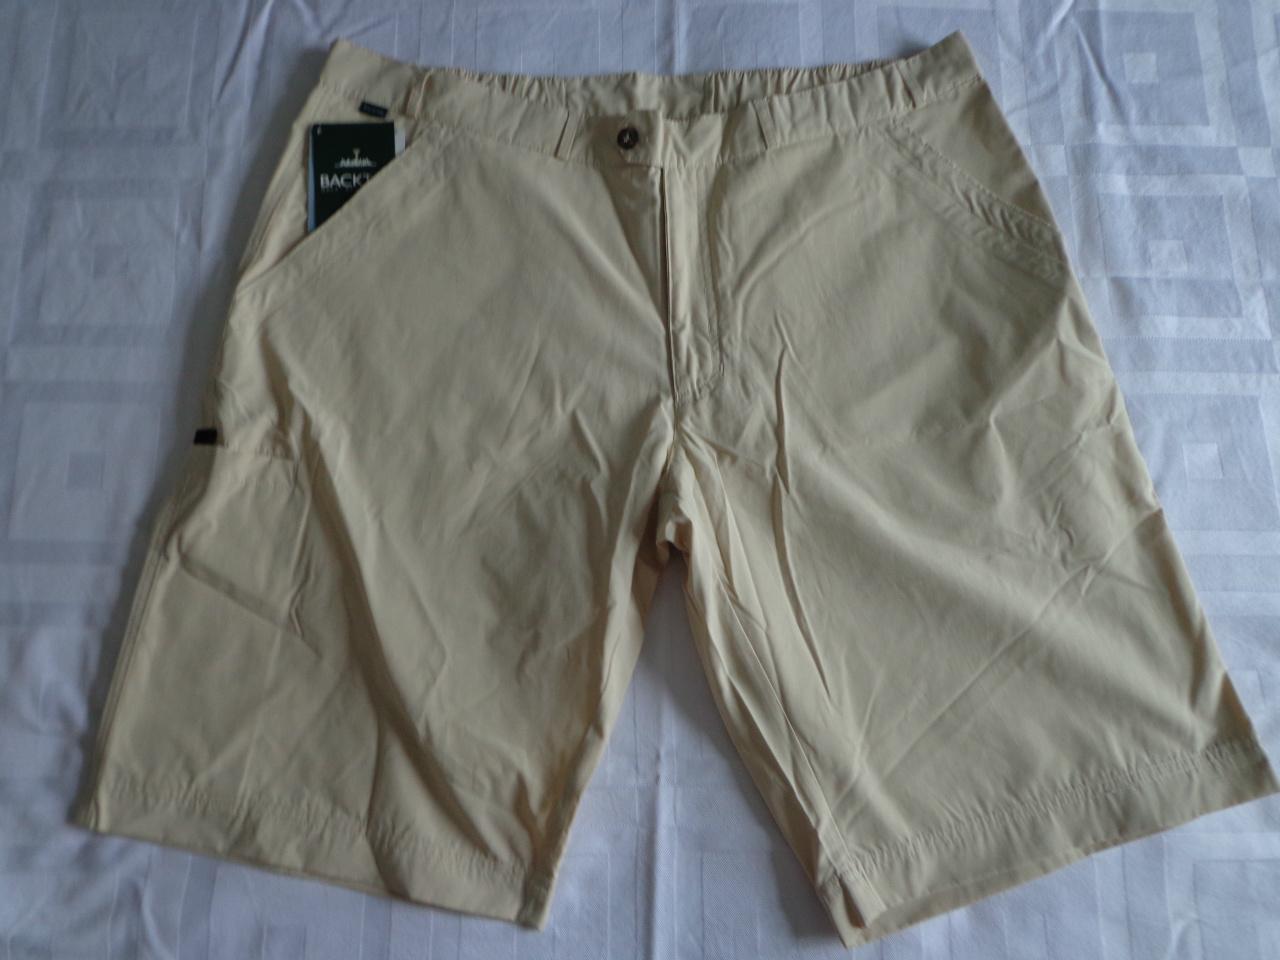 BackTee shorts i sand